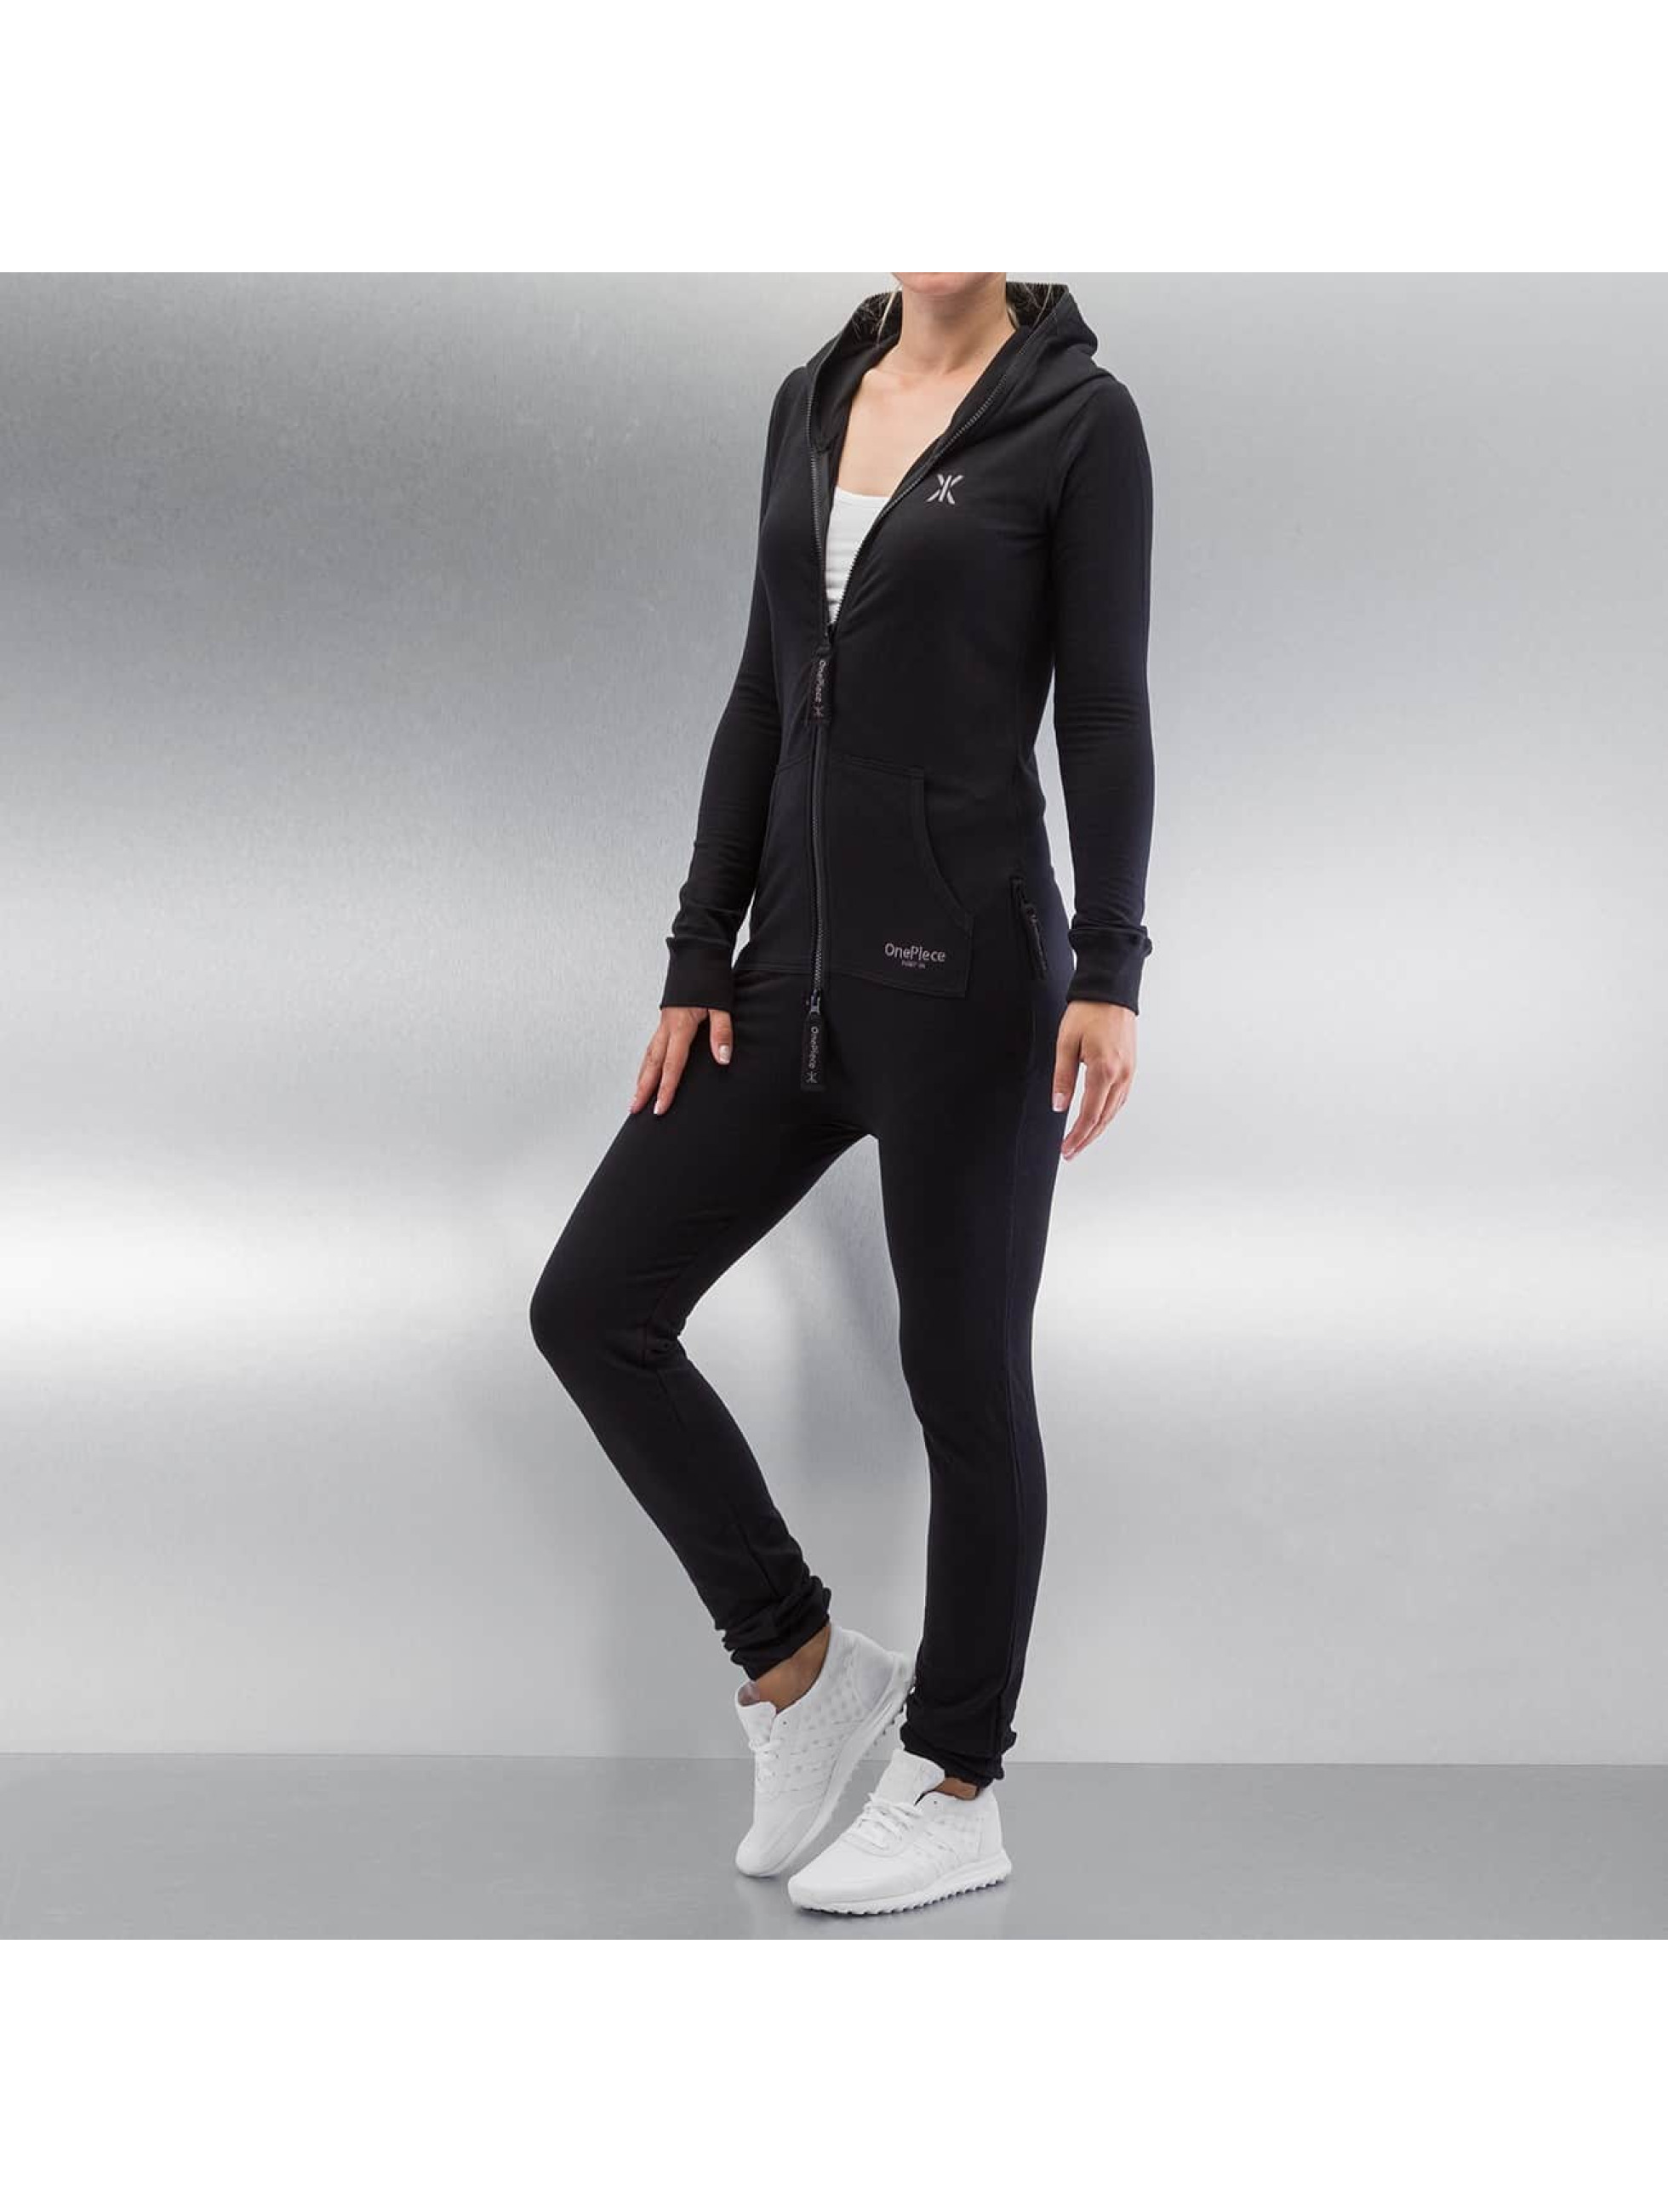 Jumpsuit Original Slim in schwarz